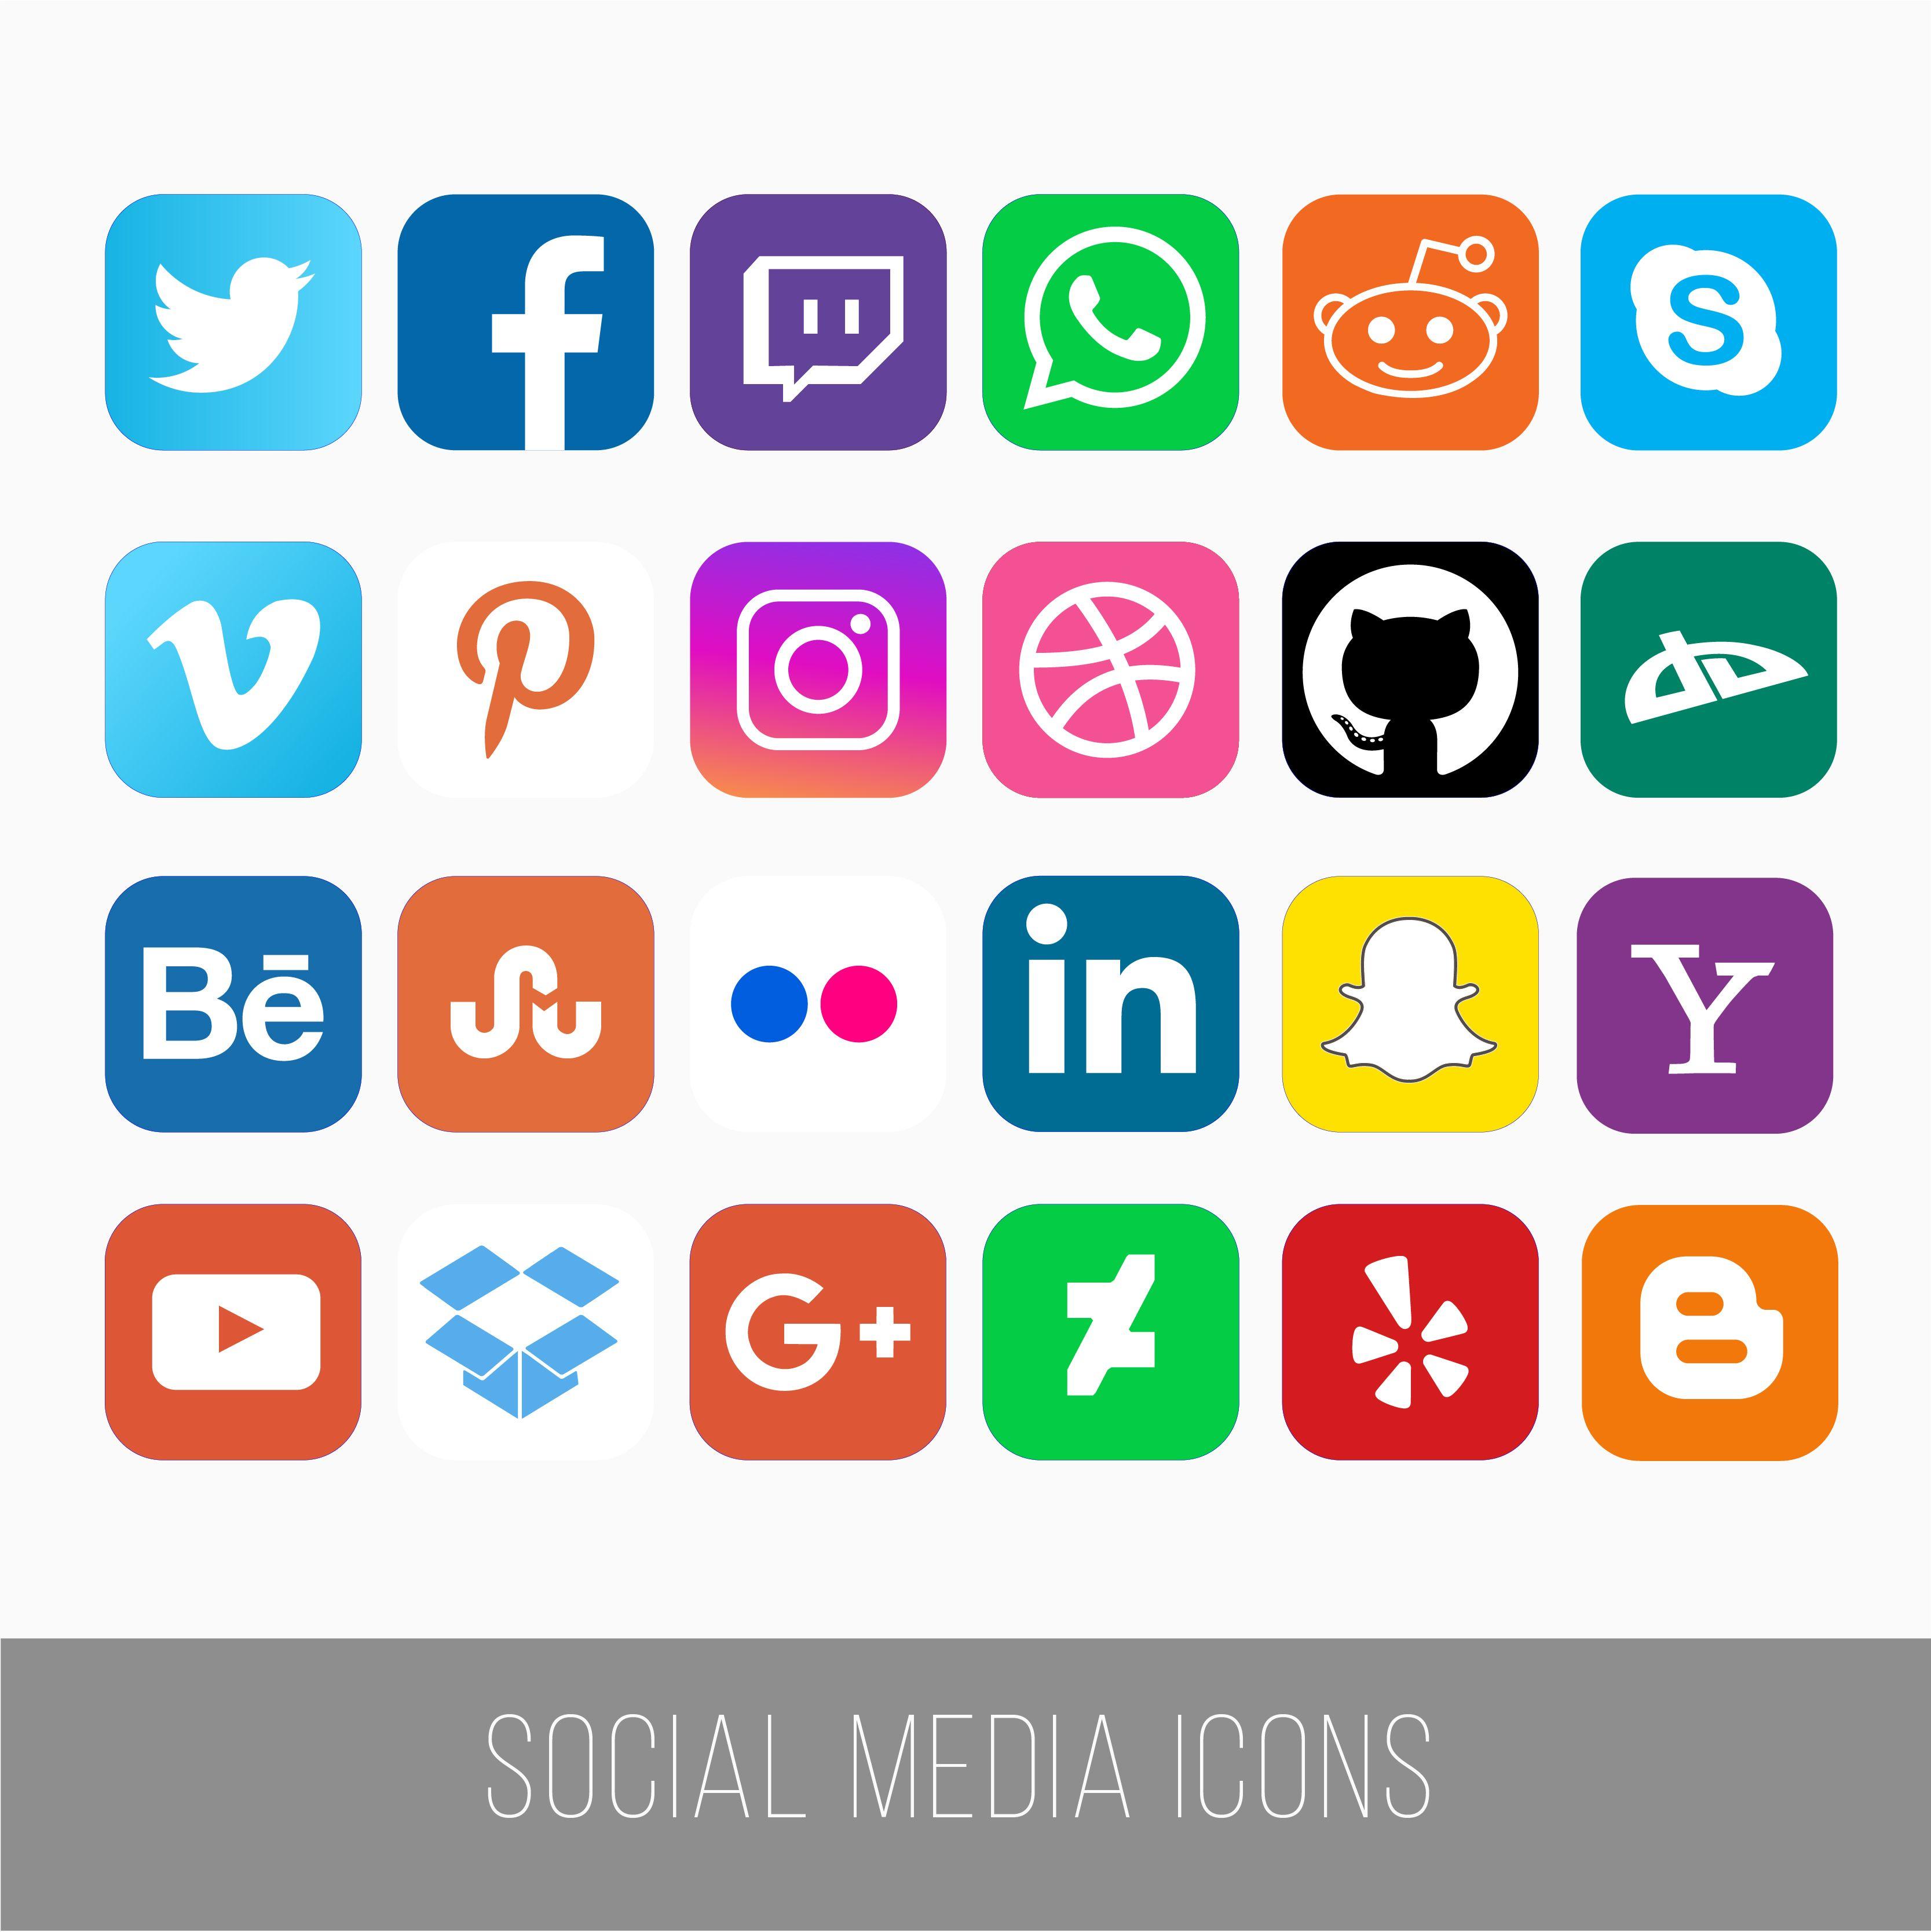 Social Media Icons Social media icons, Media icon